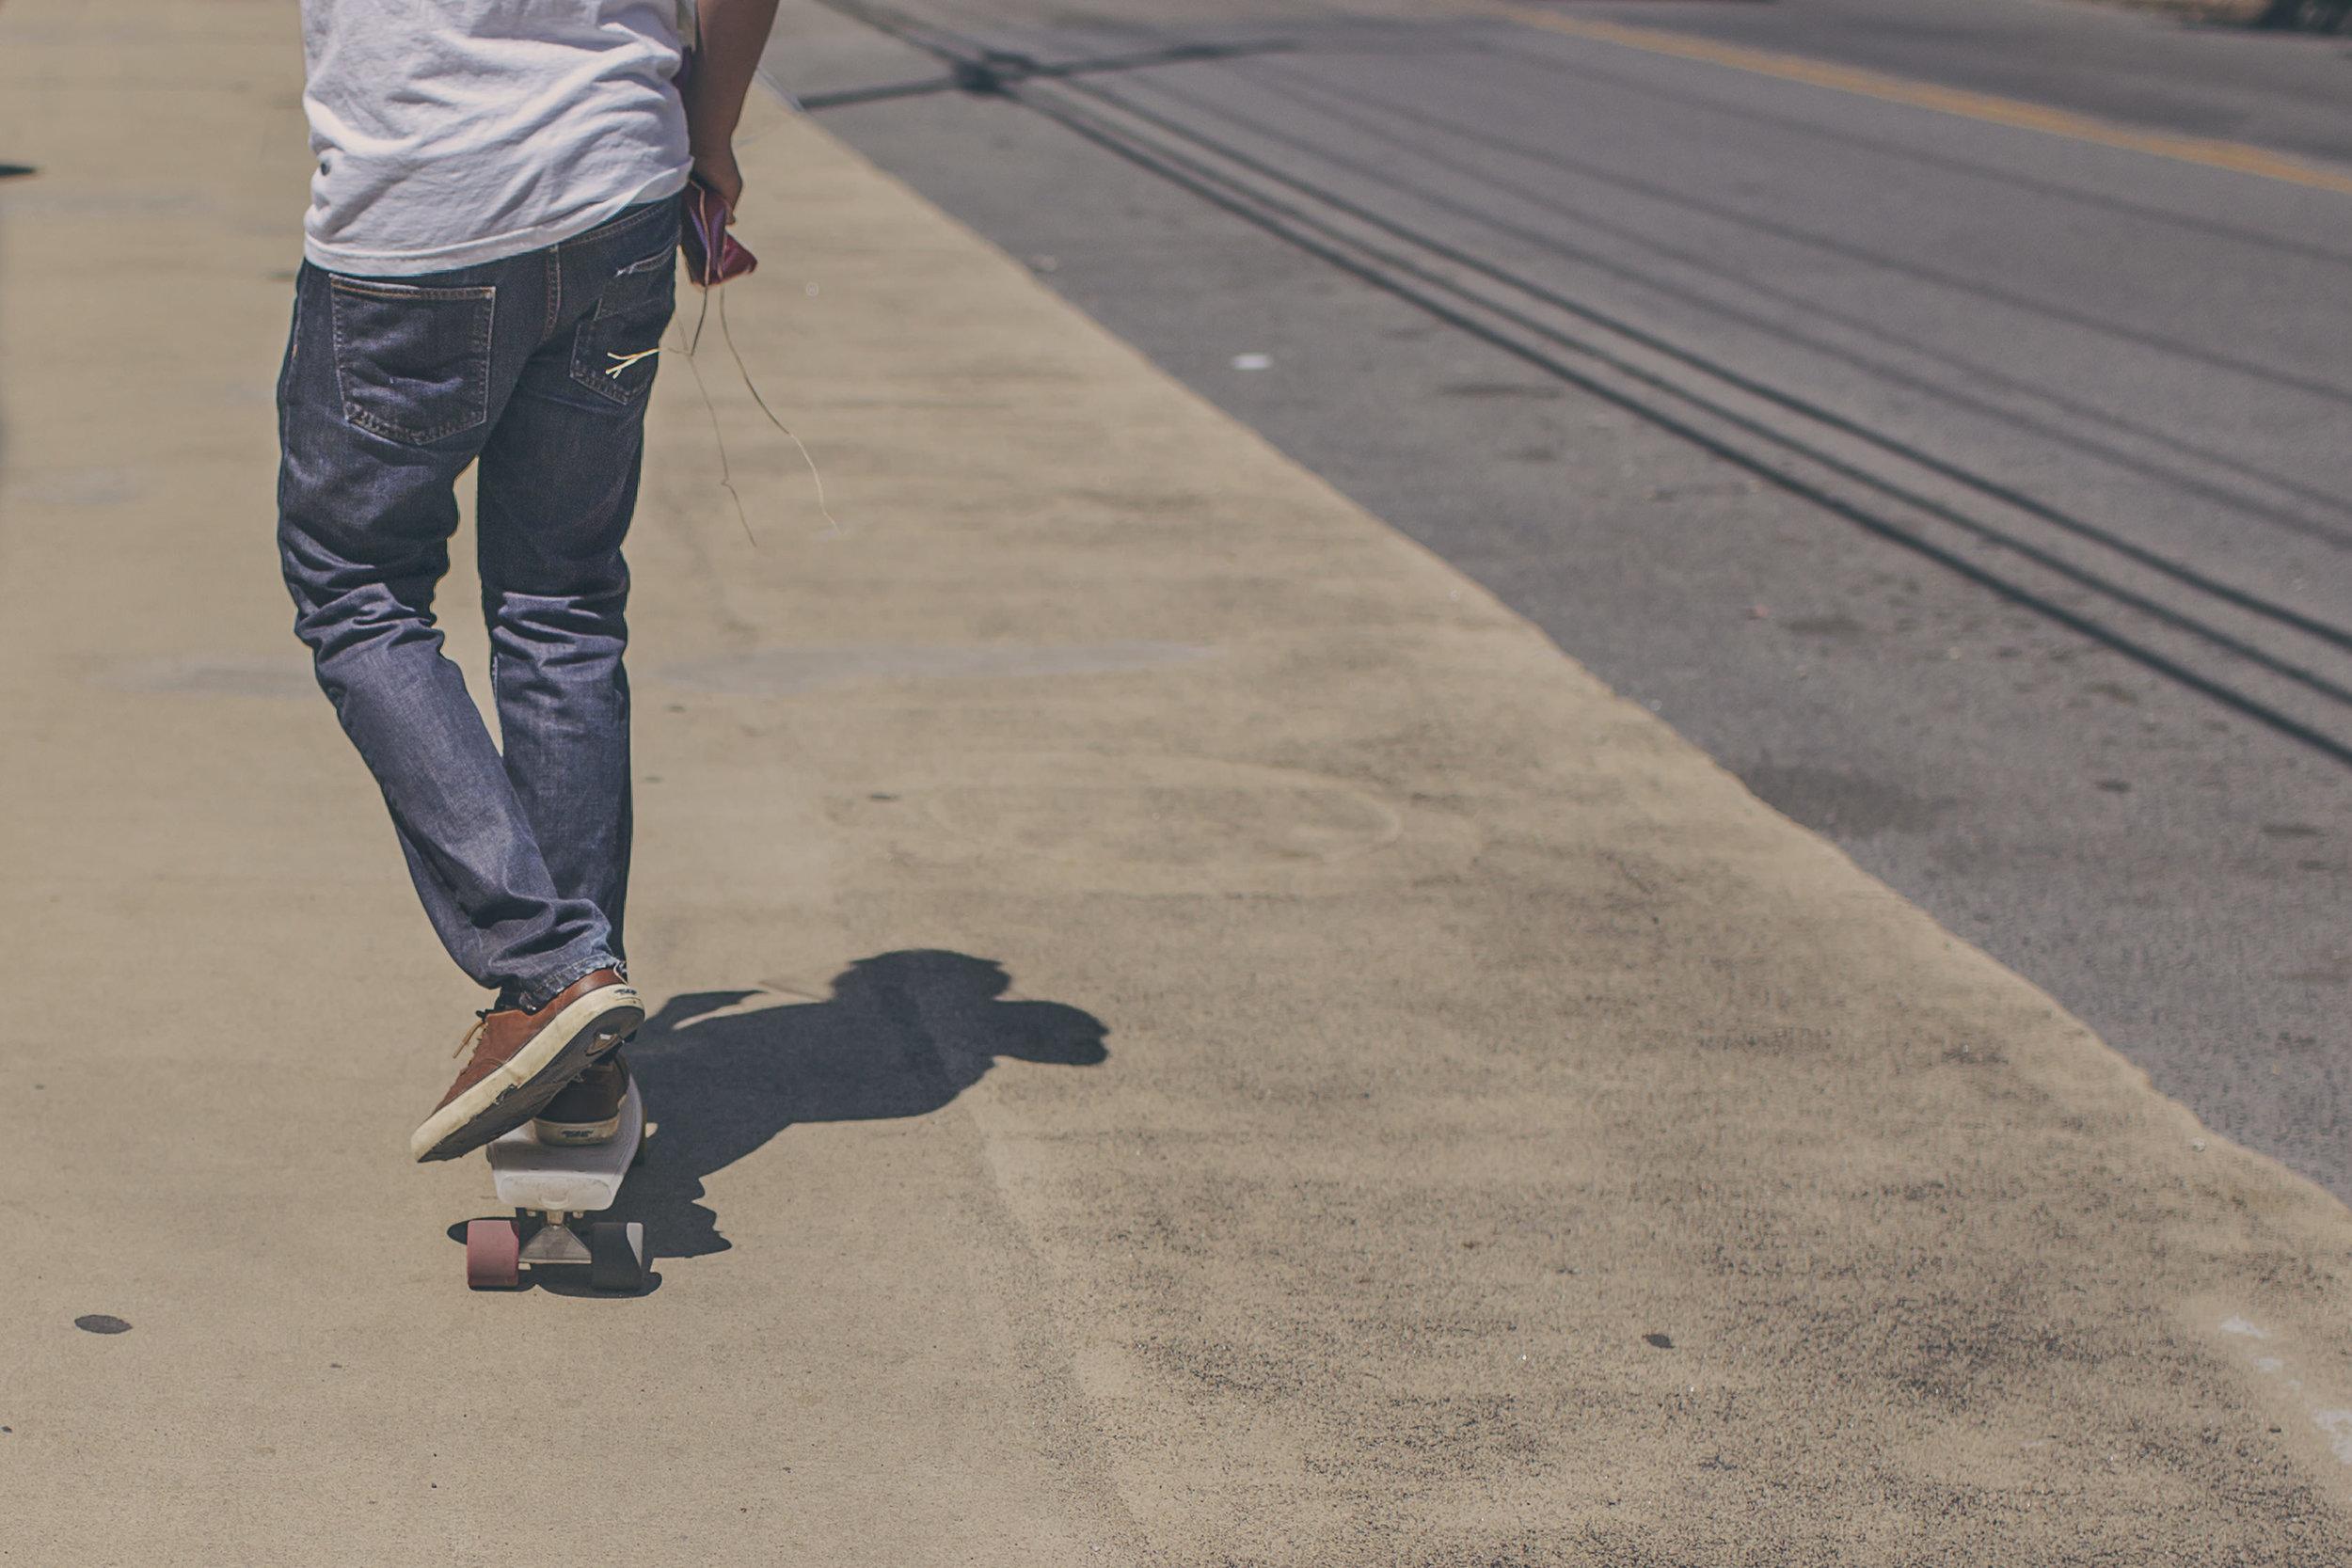 boss-fight-stock-images-photos-free-photography-man-skateboard[1].jpg